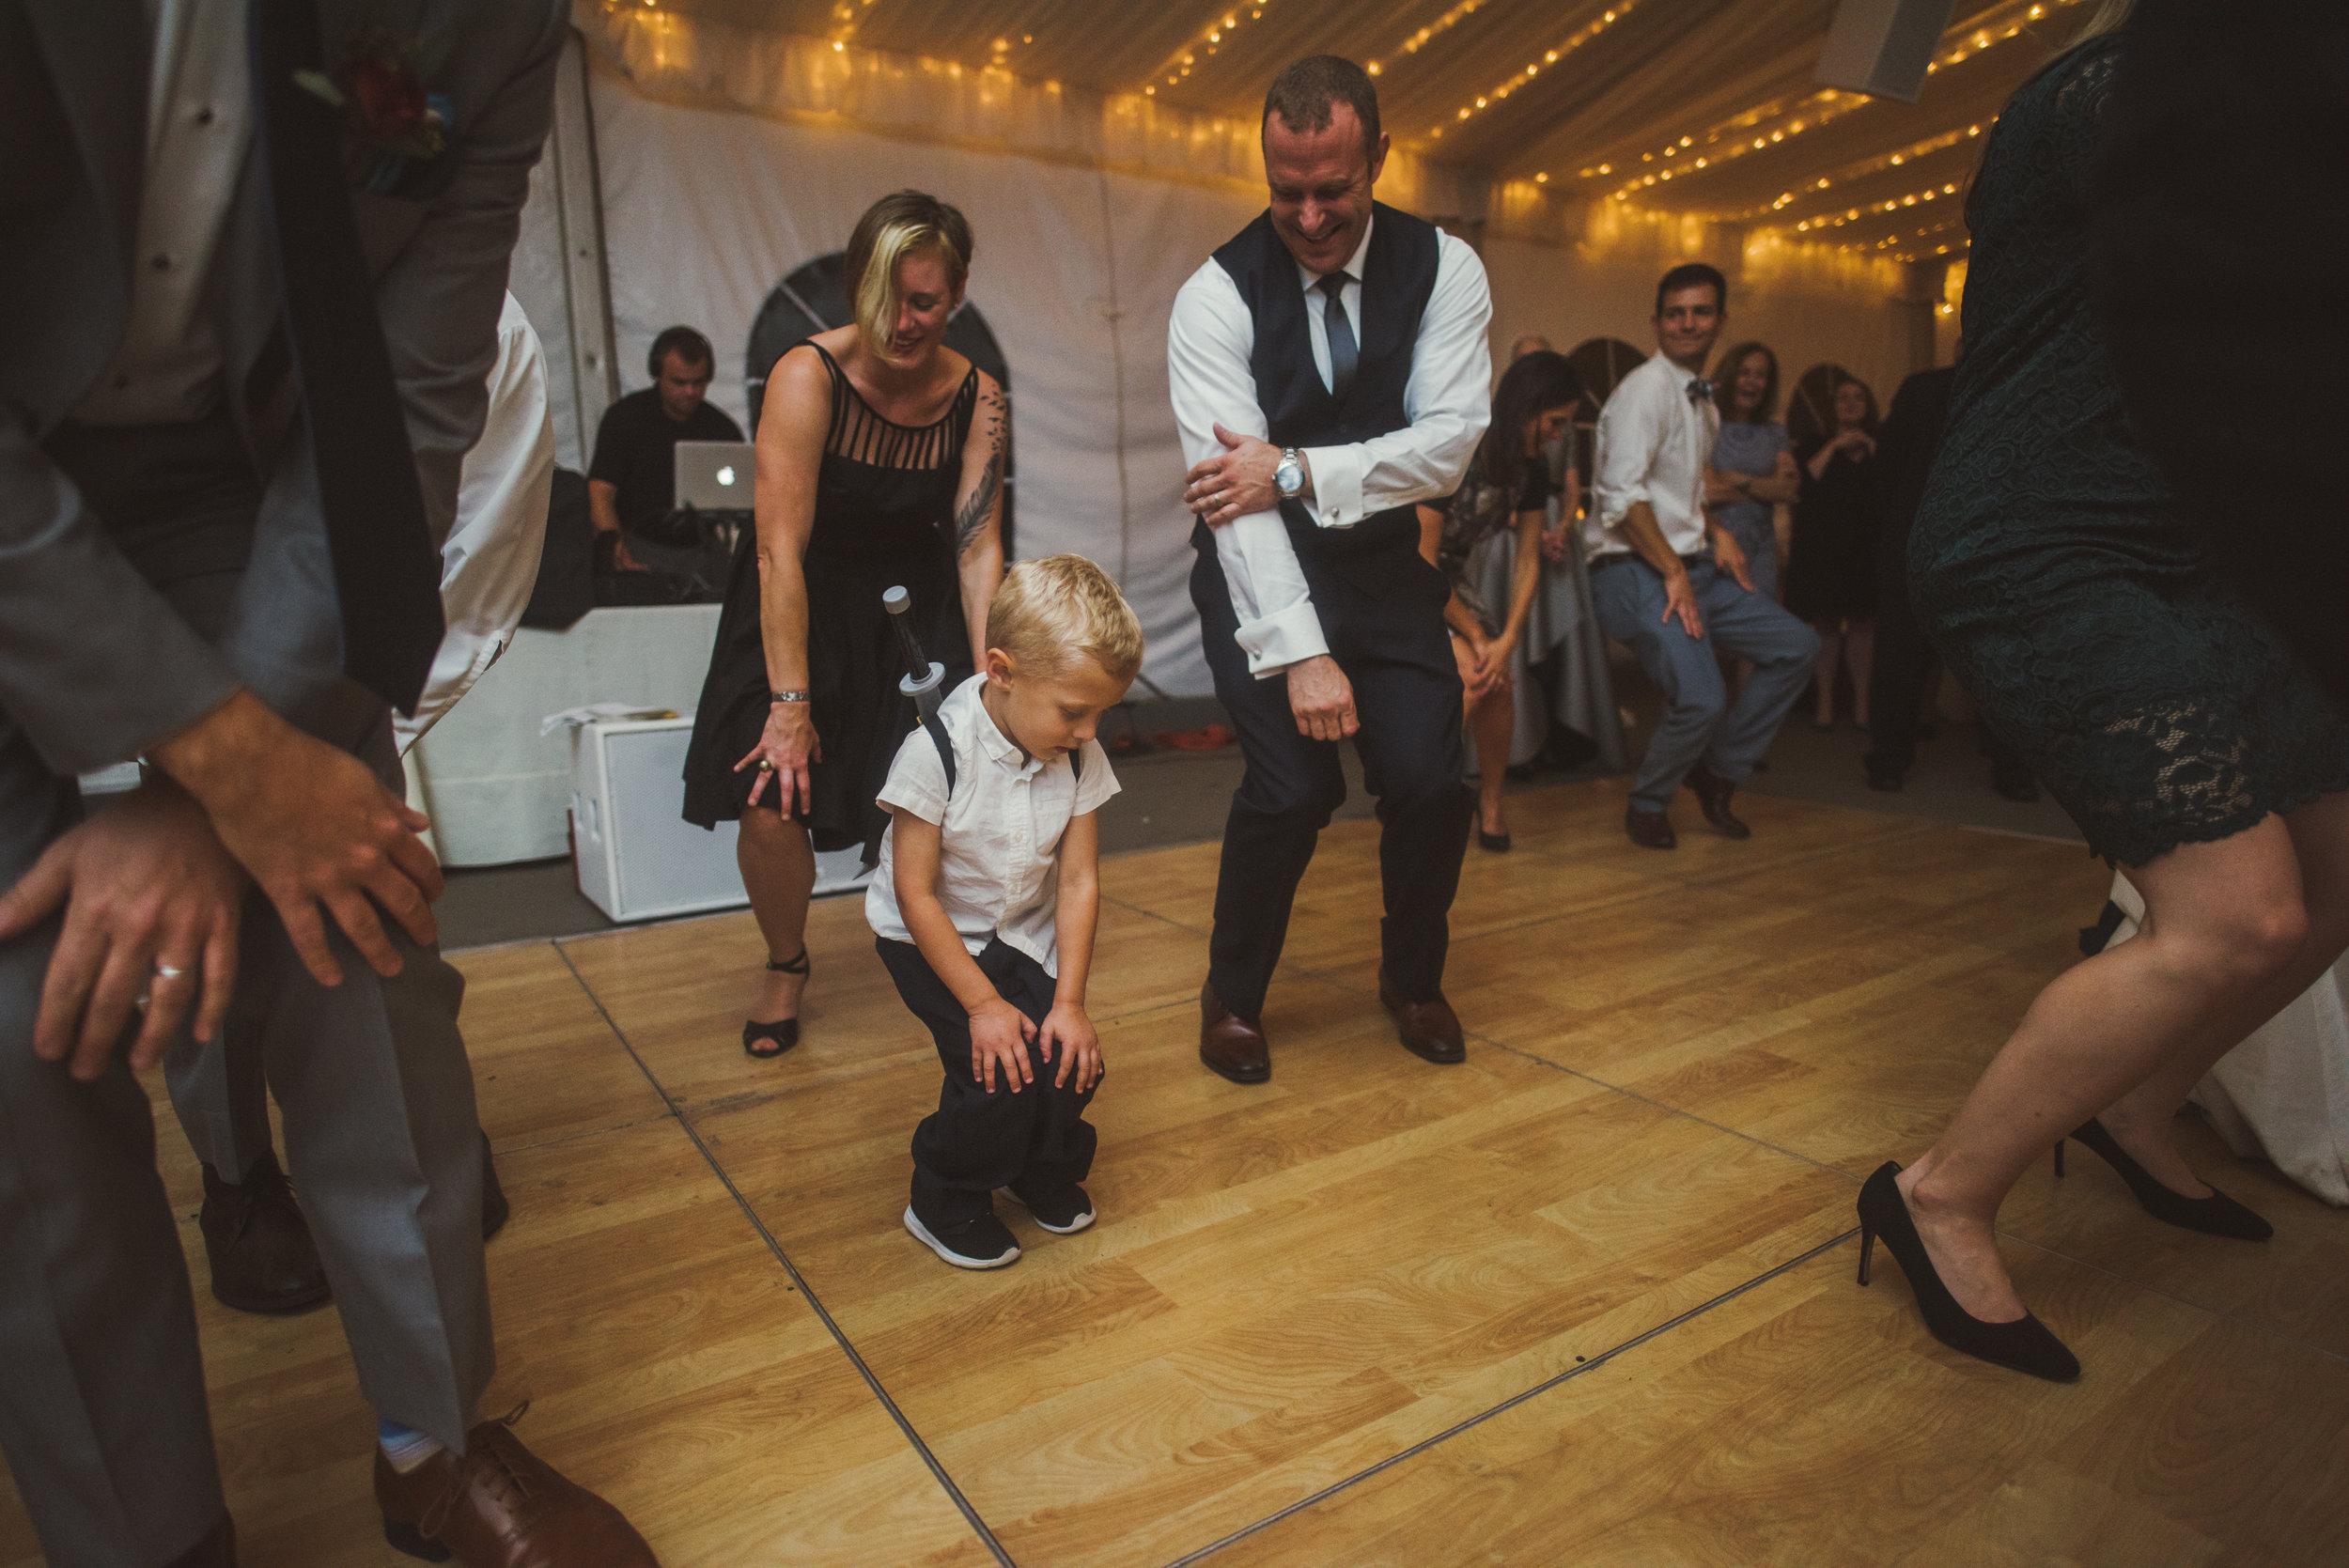 JACQUELINE & ANDREW WARSHAWER -BROOKMILL FARM FALL WEDDING - INTIMATE WEDDING PHOTOGRAPHER - TWOTWENTY by CHI-CHI AGBIM-743.jpg